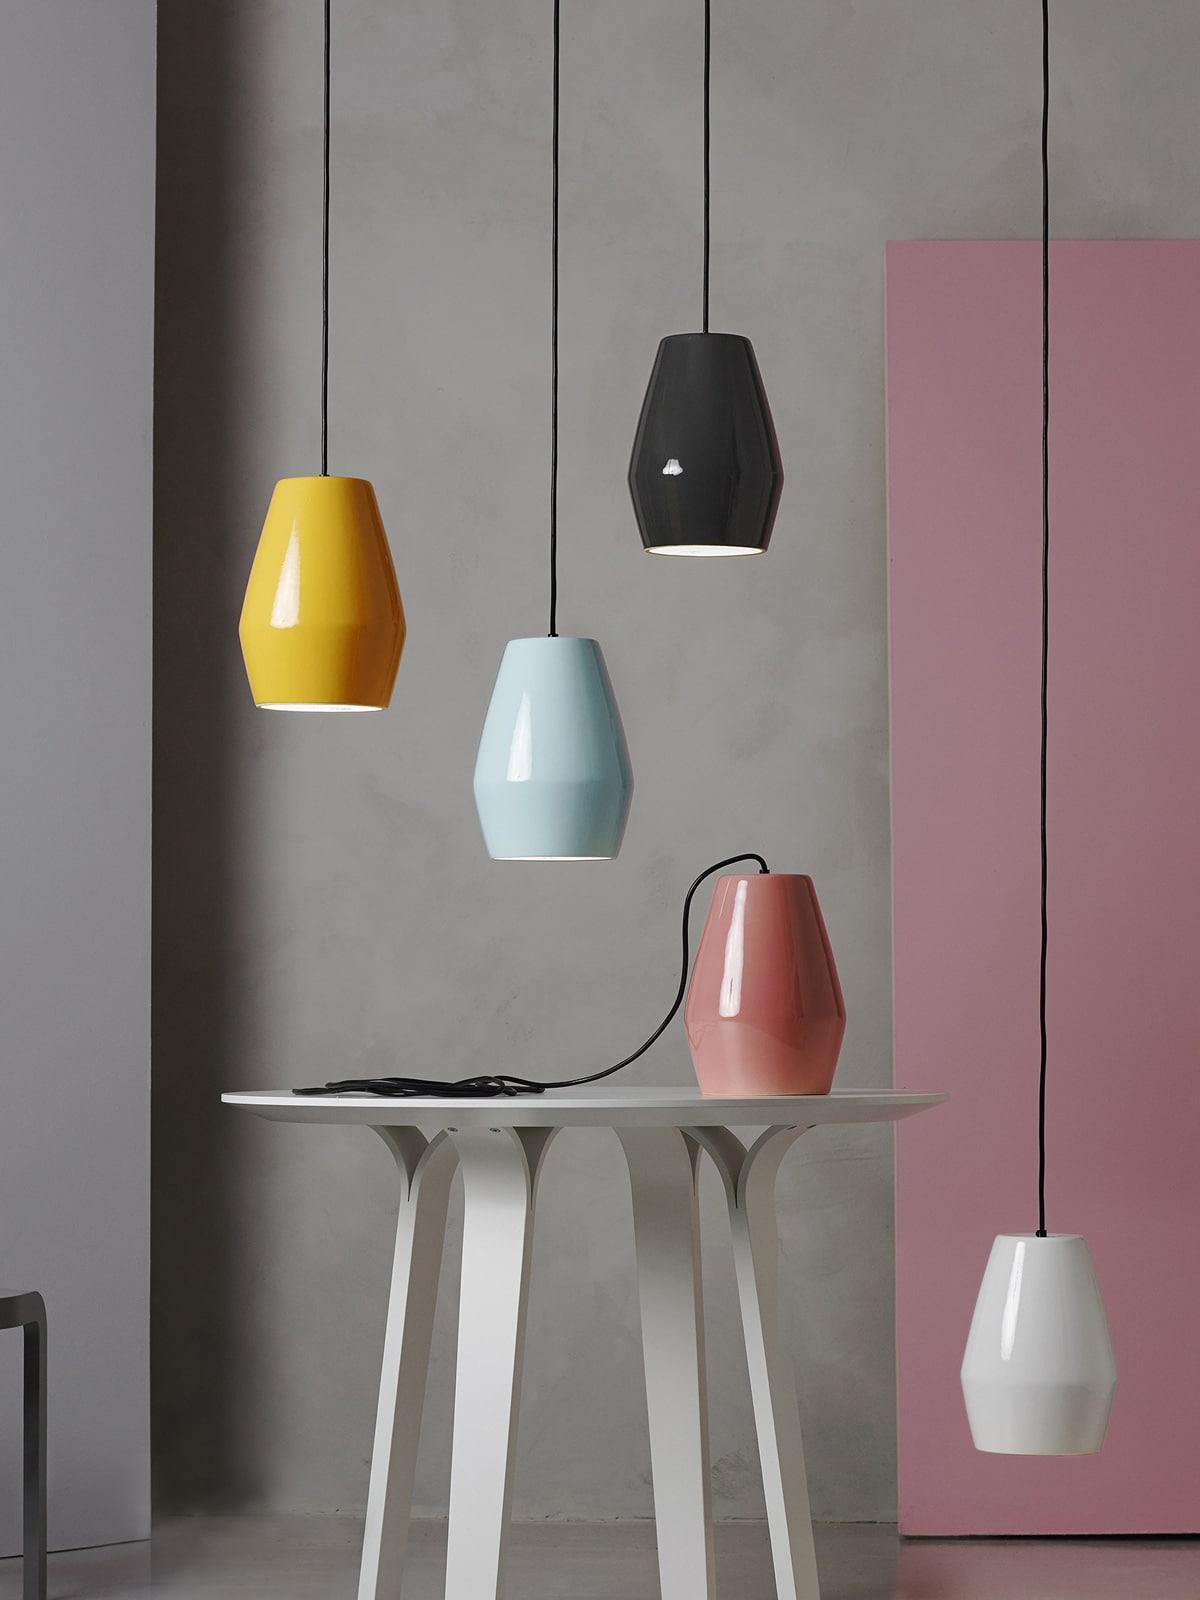 Belle Pendelleuchte In Fünf Farben Nice Ideas